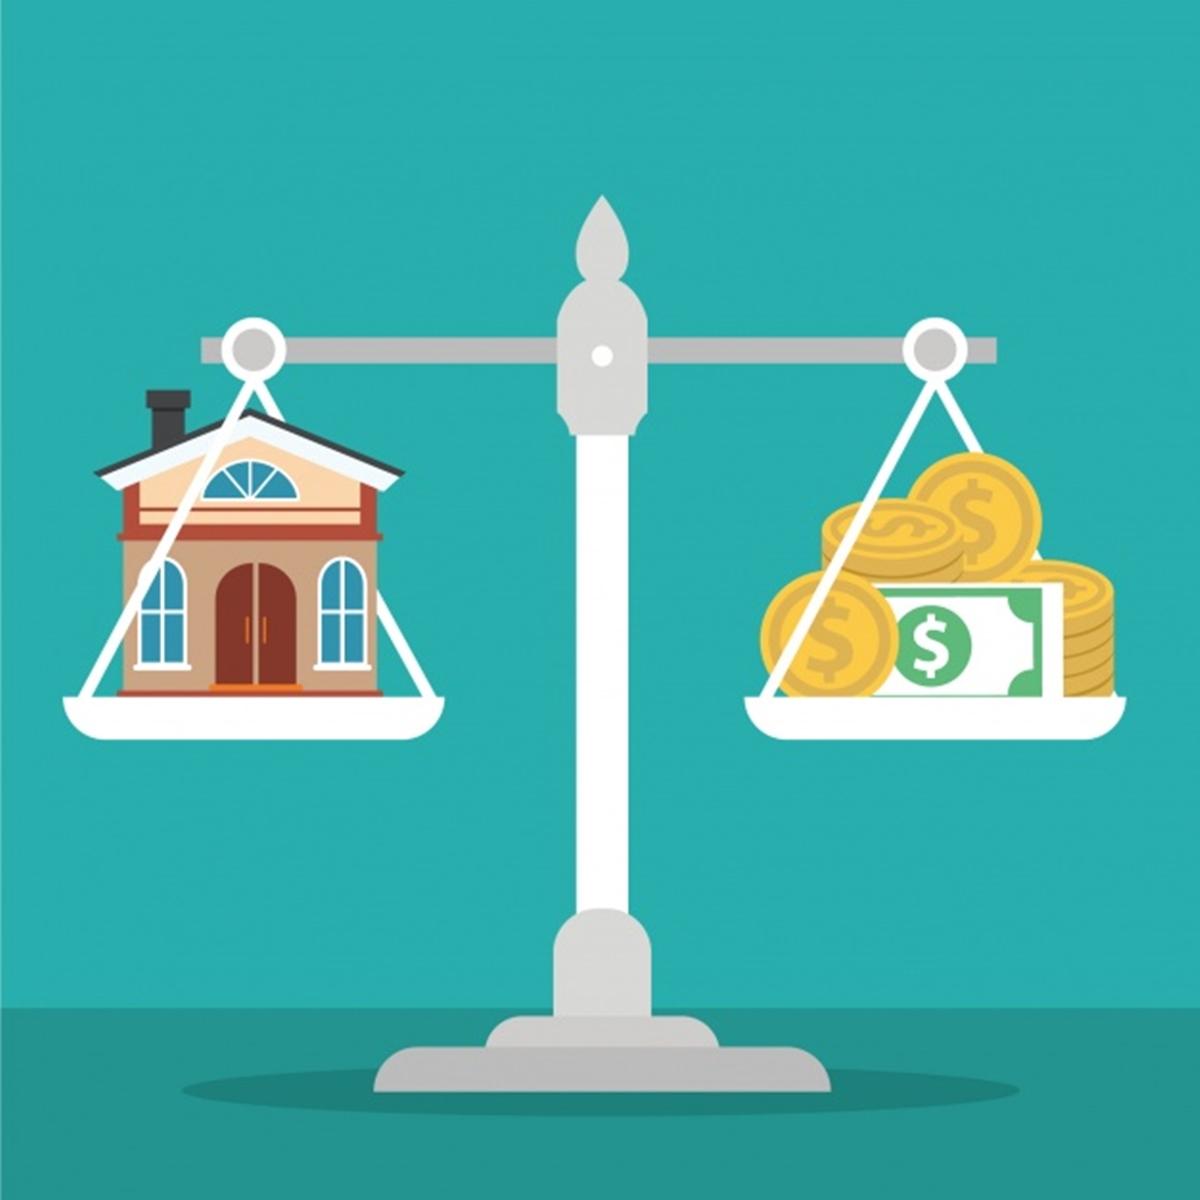 Payments balance transactions